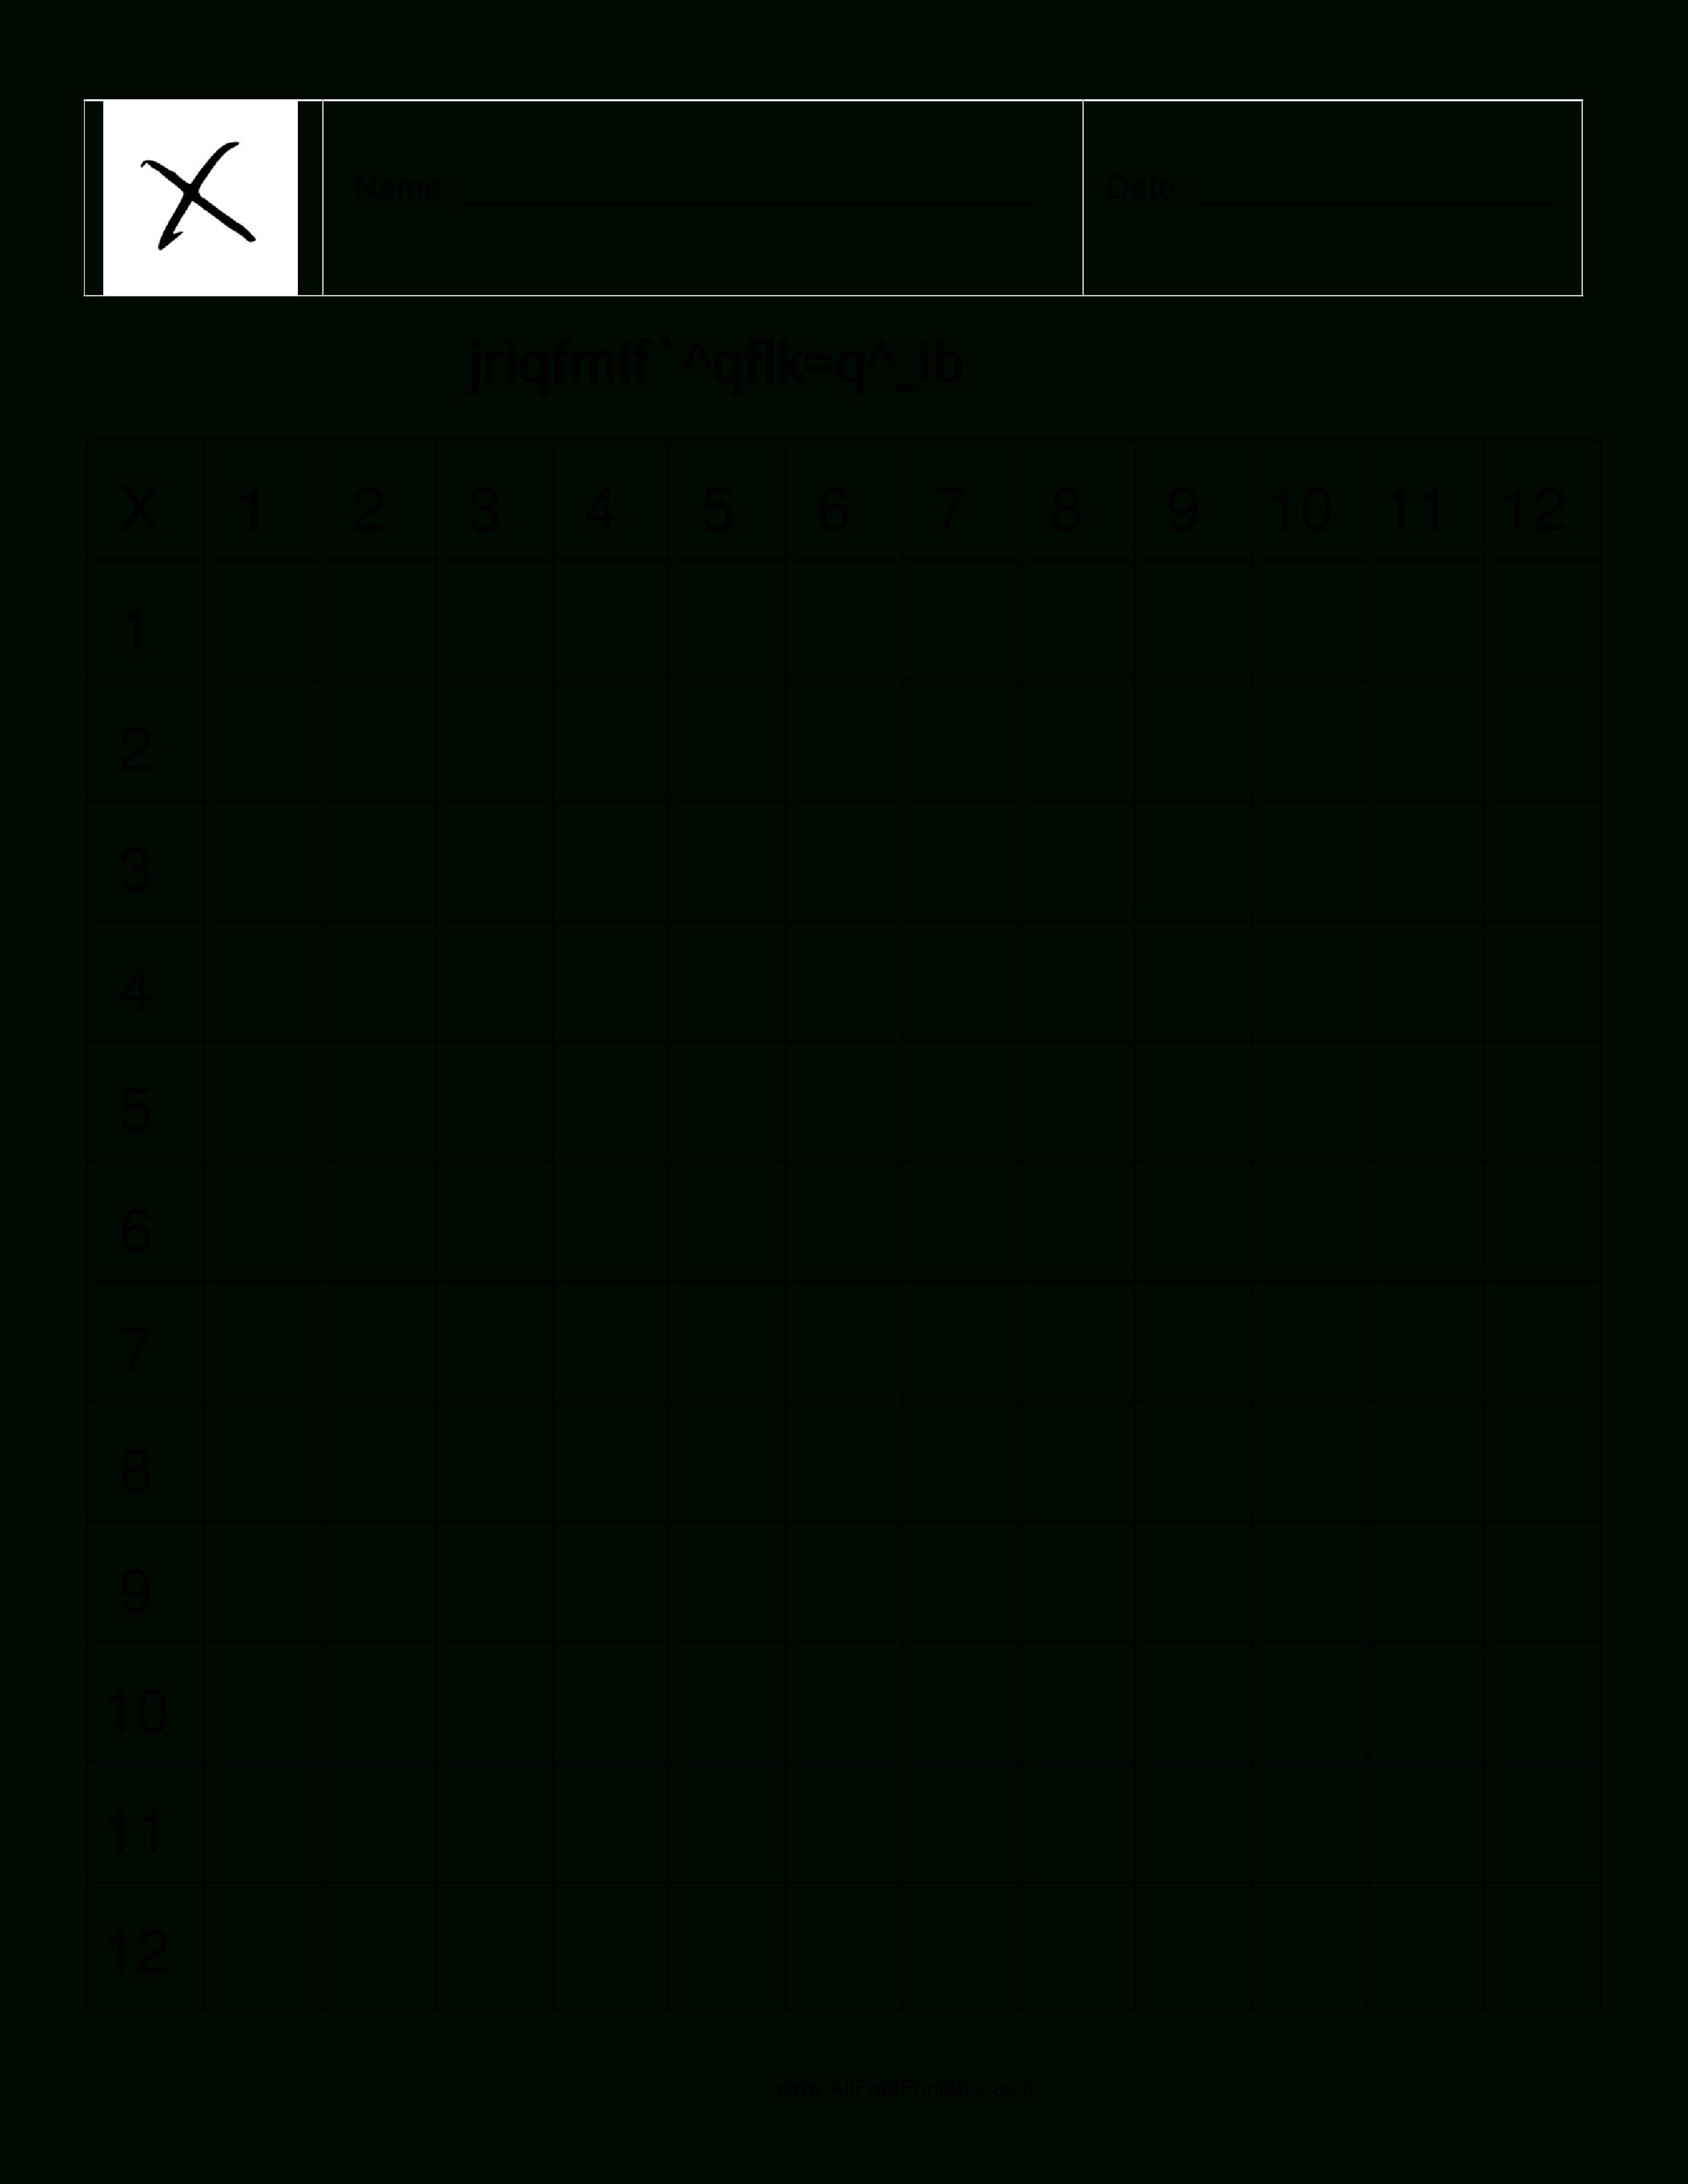 Free Printable Blank Multiplication Table   Multiplication Table - Free Printable Blank Multiplication Table 1 12